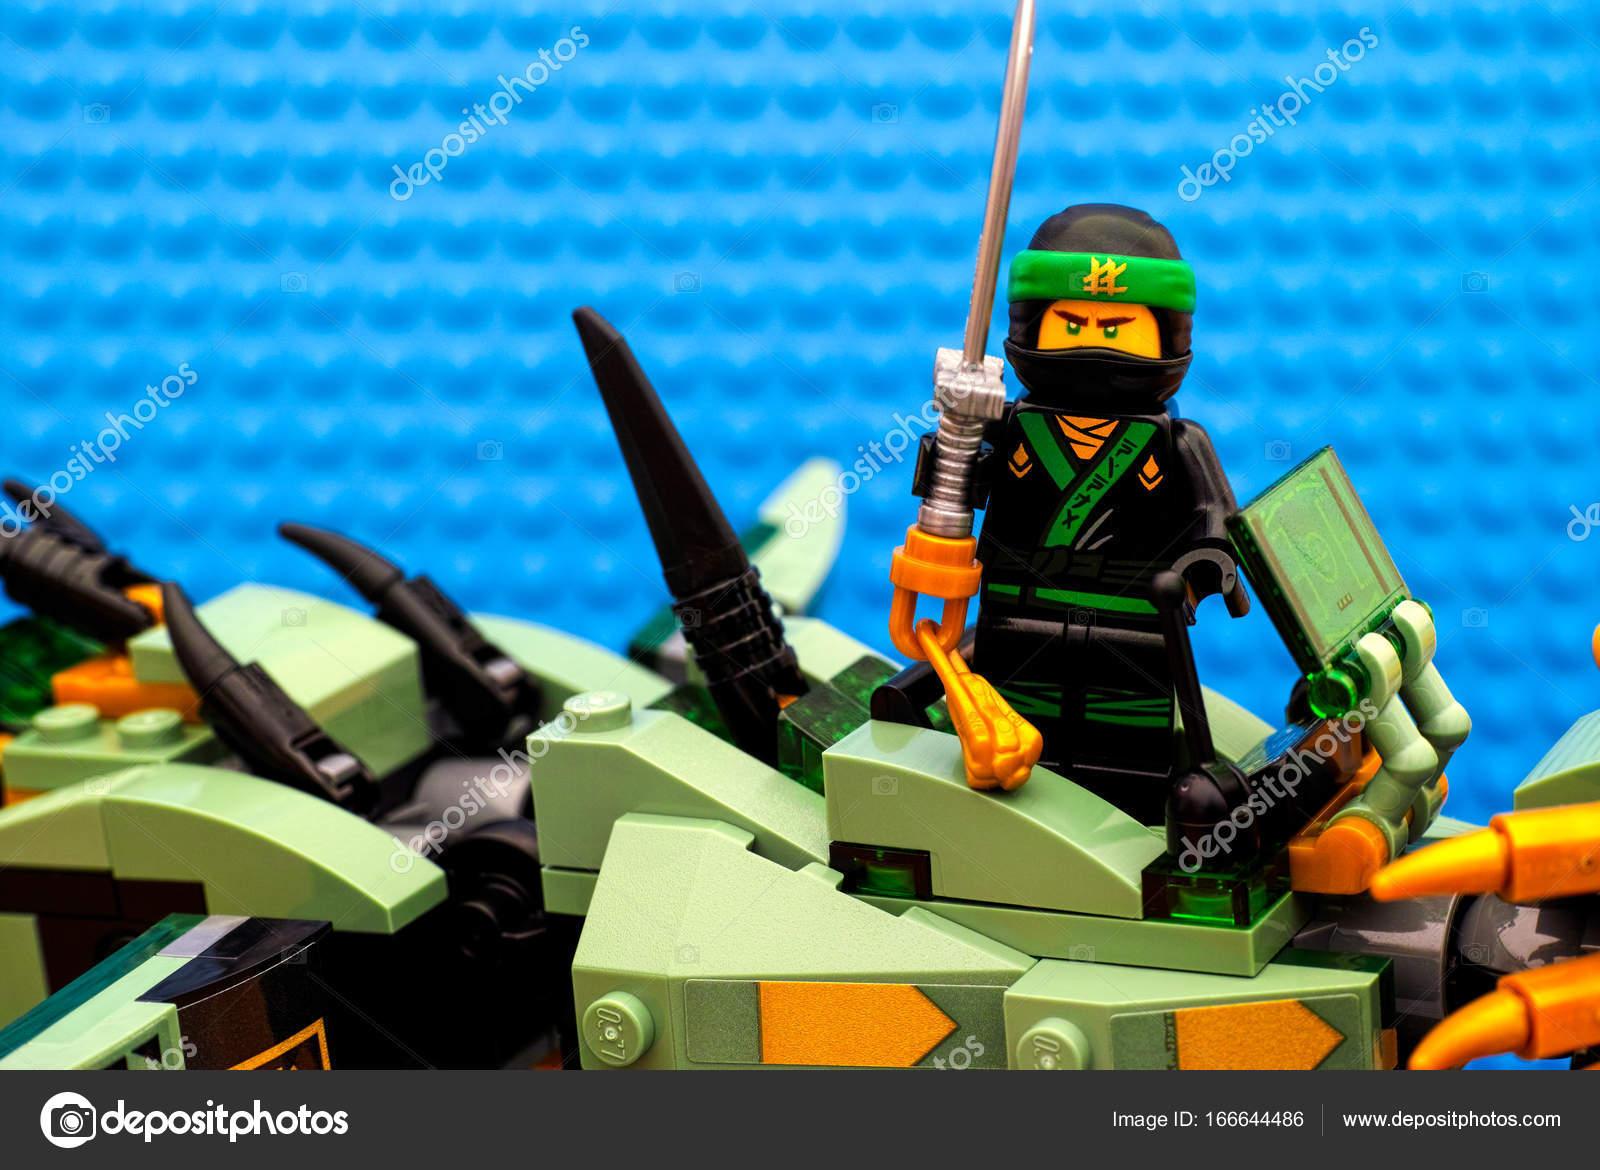 Lego Green MovieThe Ninjago Standing Ninja Mech On zMVGSUqp